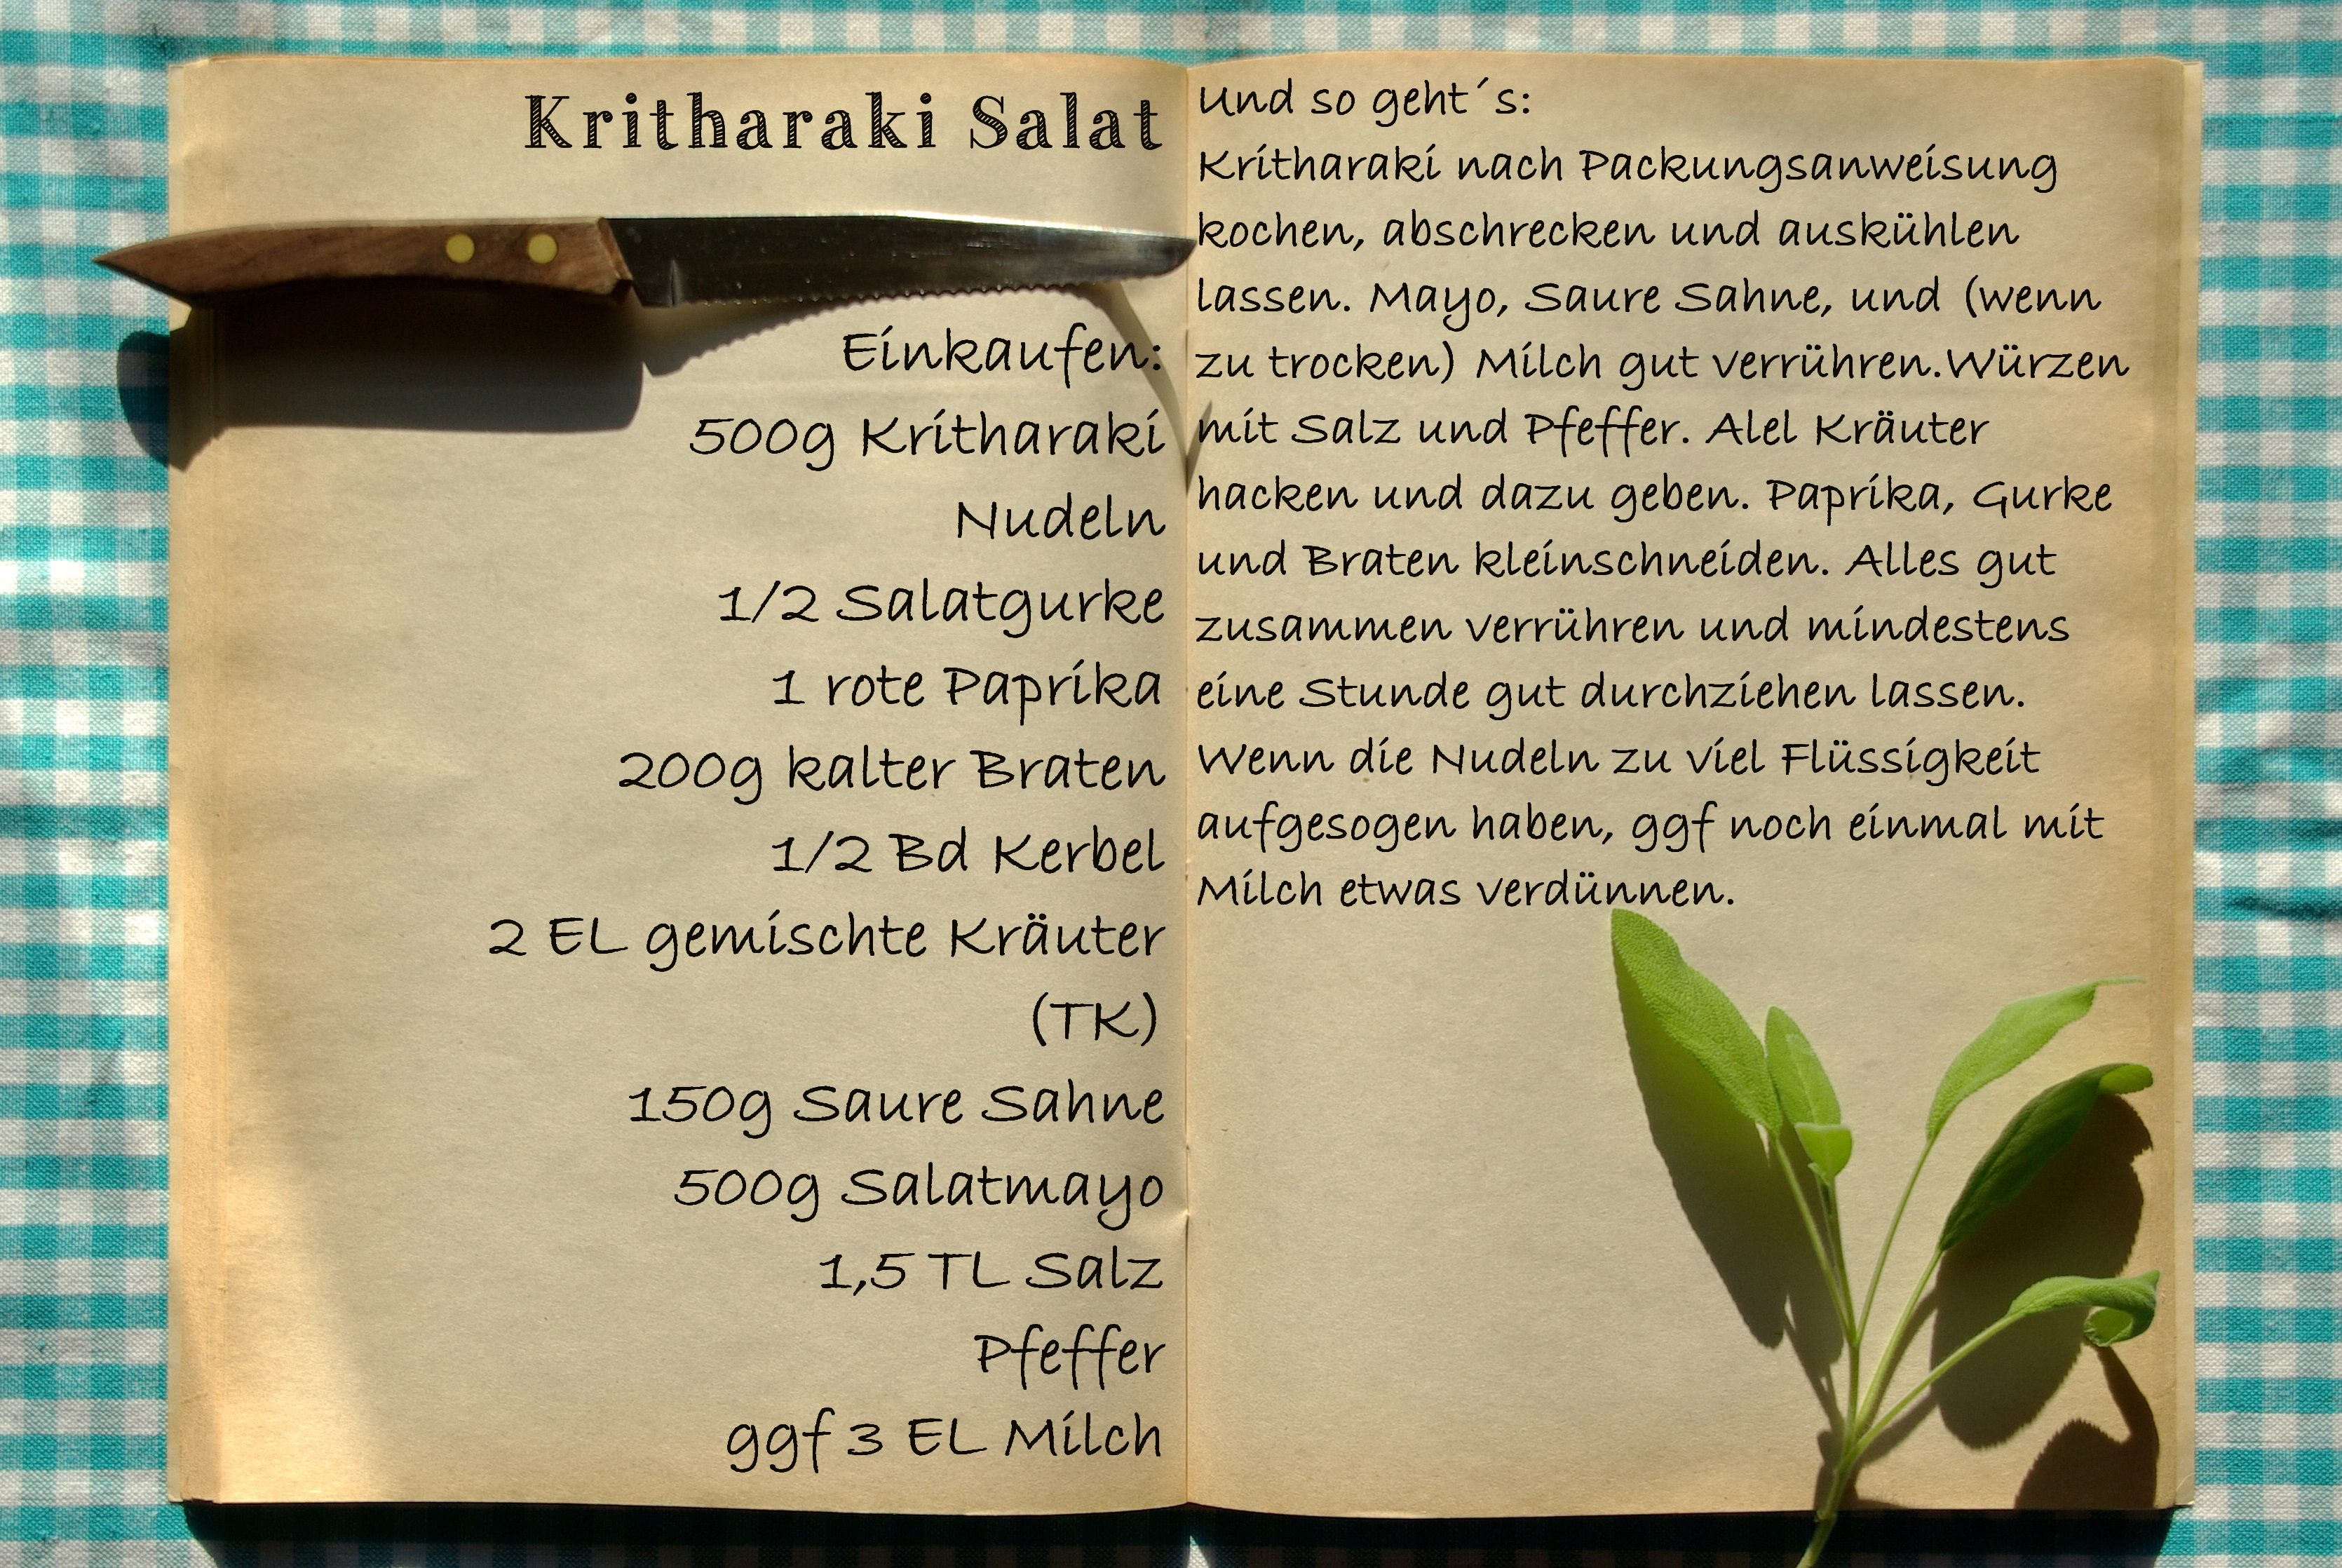 Einkaufszettel Kritharaki Salat by Glasgefluester